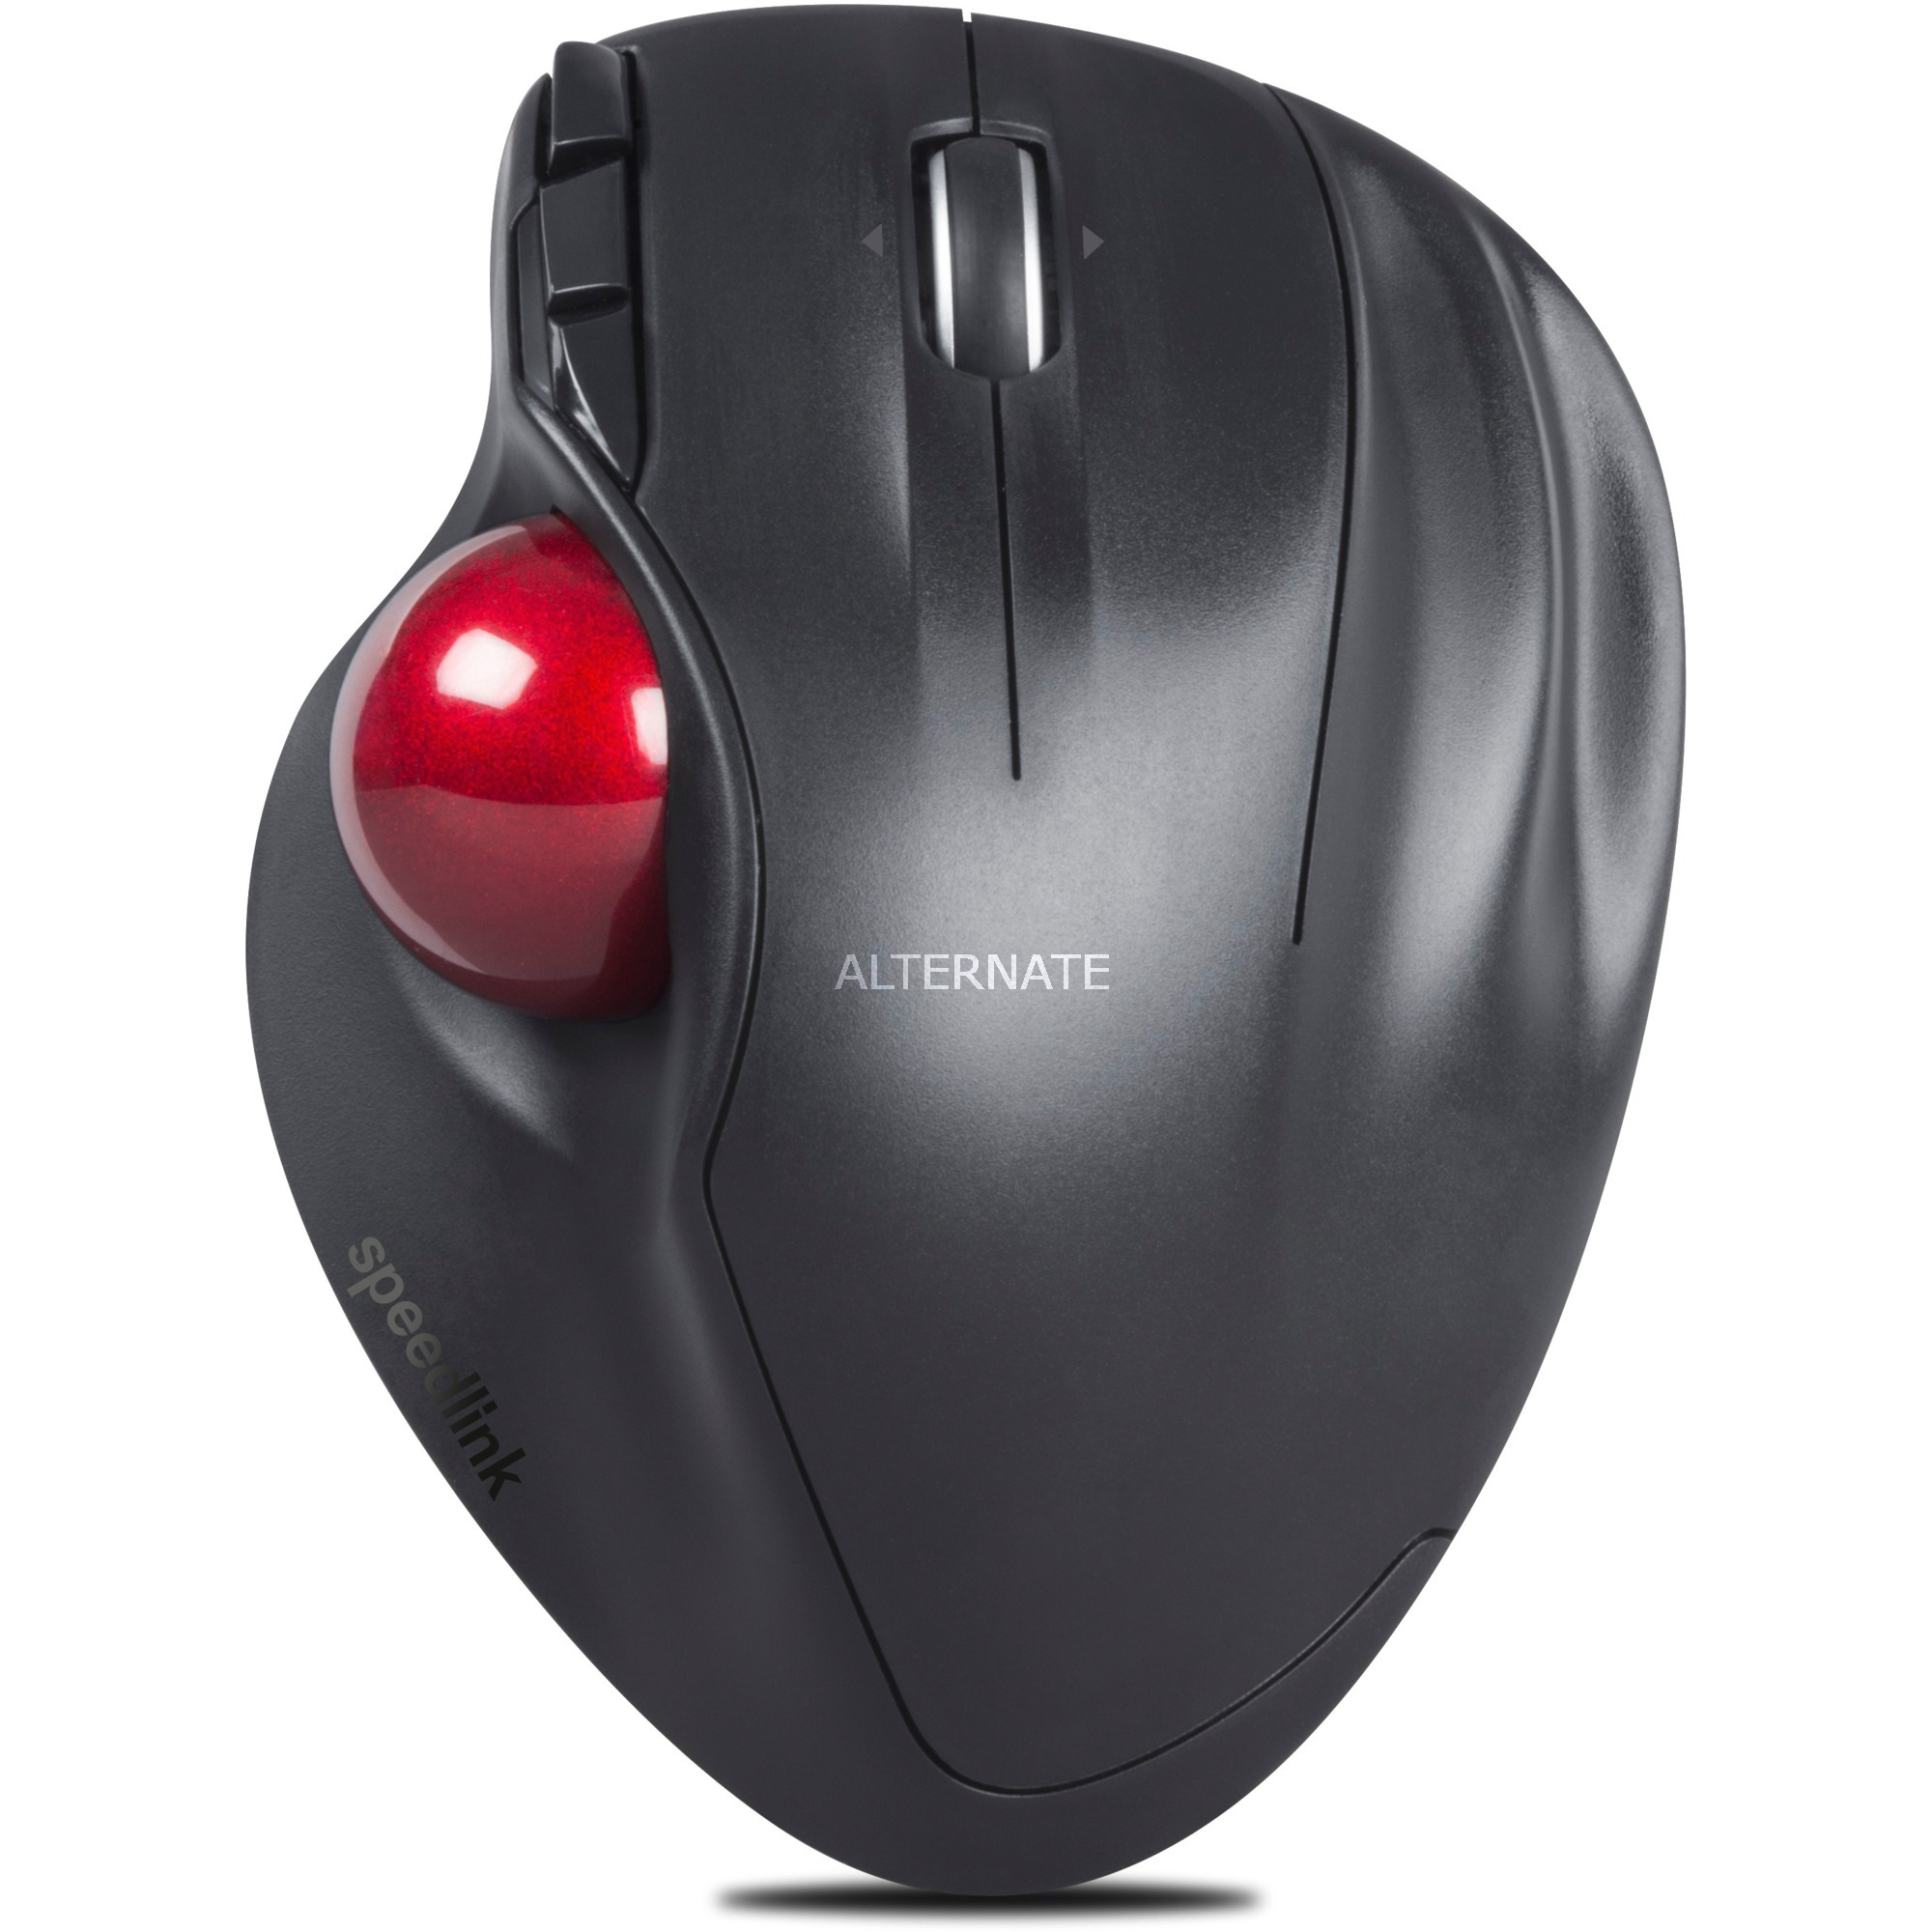 APTICO ratón RF inalámbrico Laser 1600 DPI mano derecha Negro, Trackball